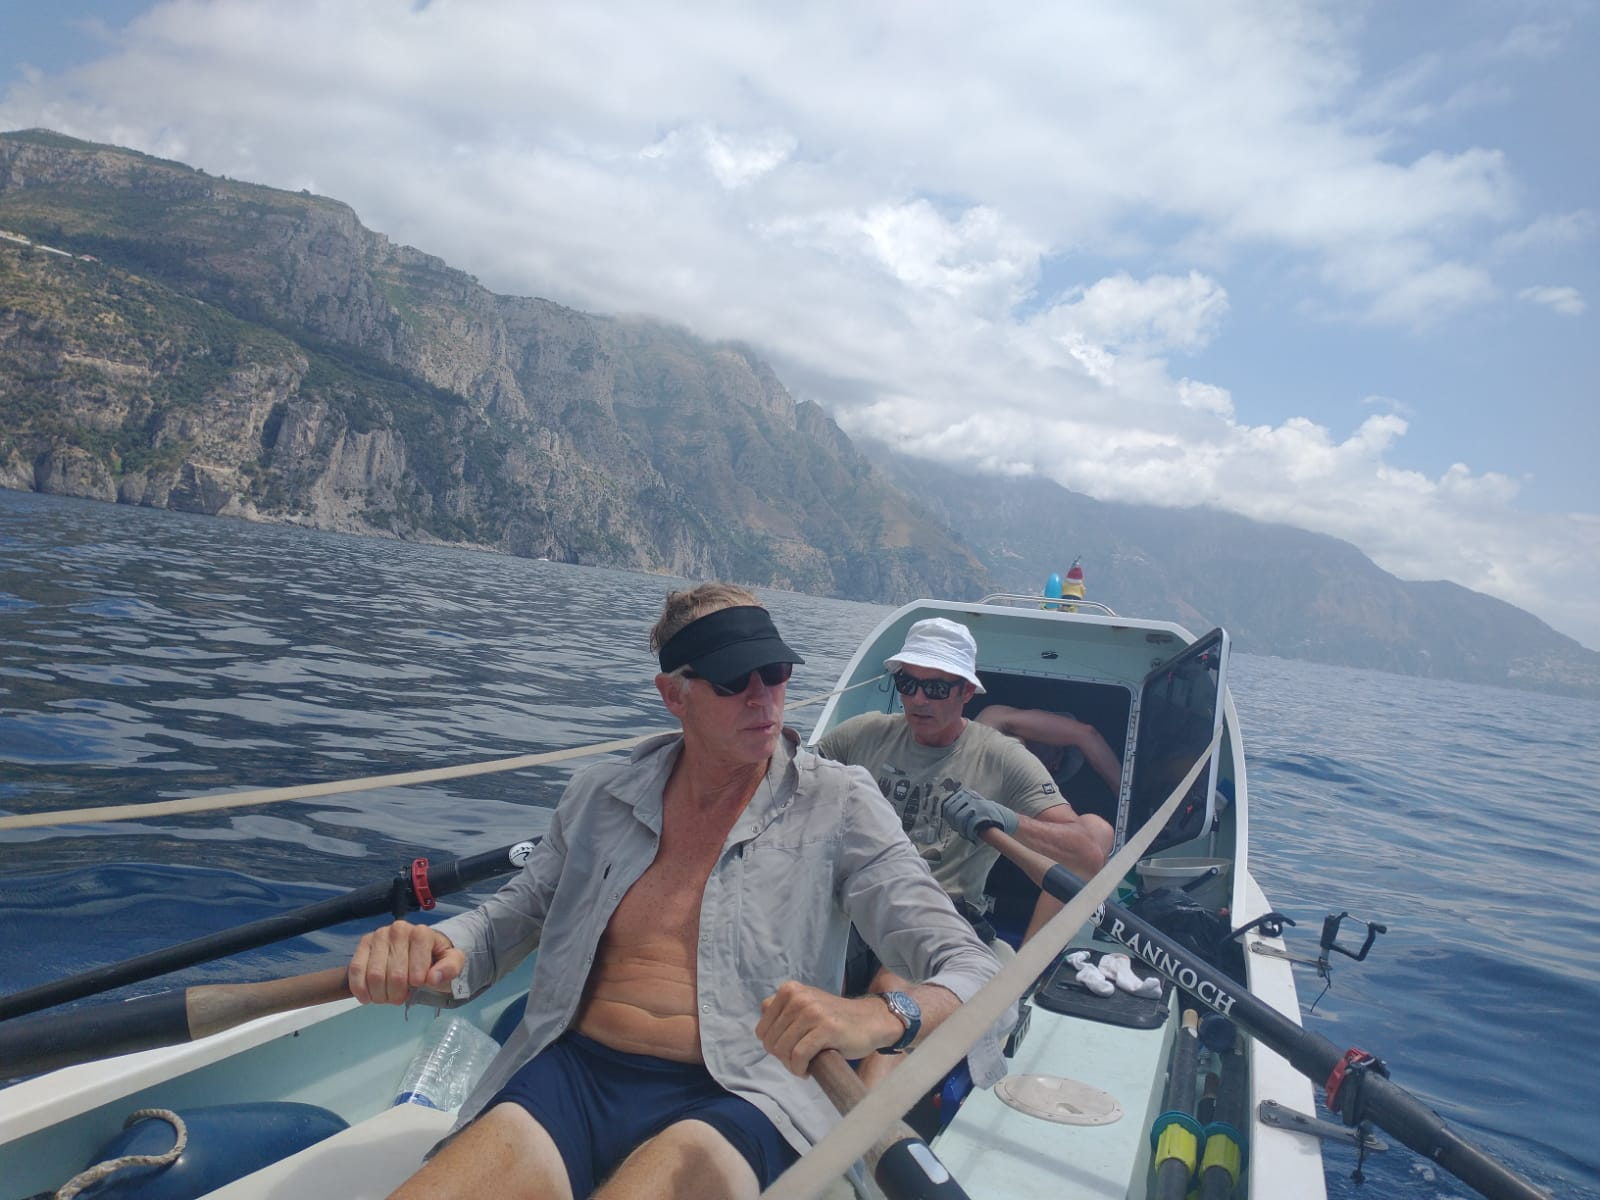 DAG 62. Going to Positano